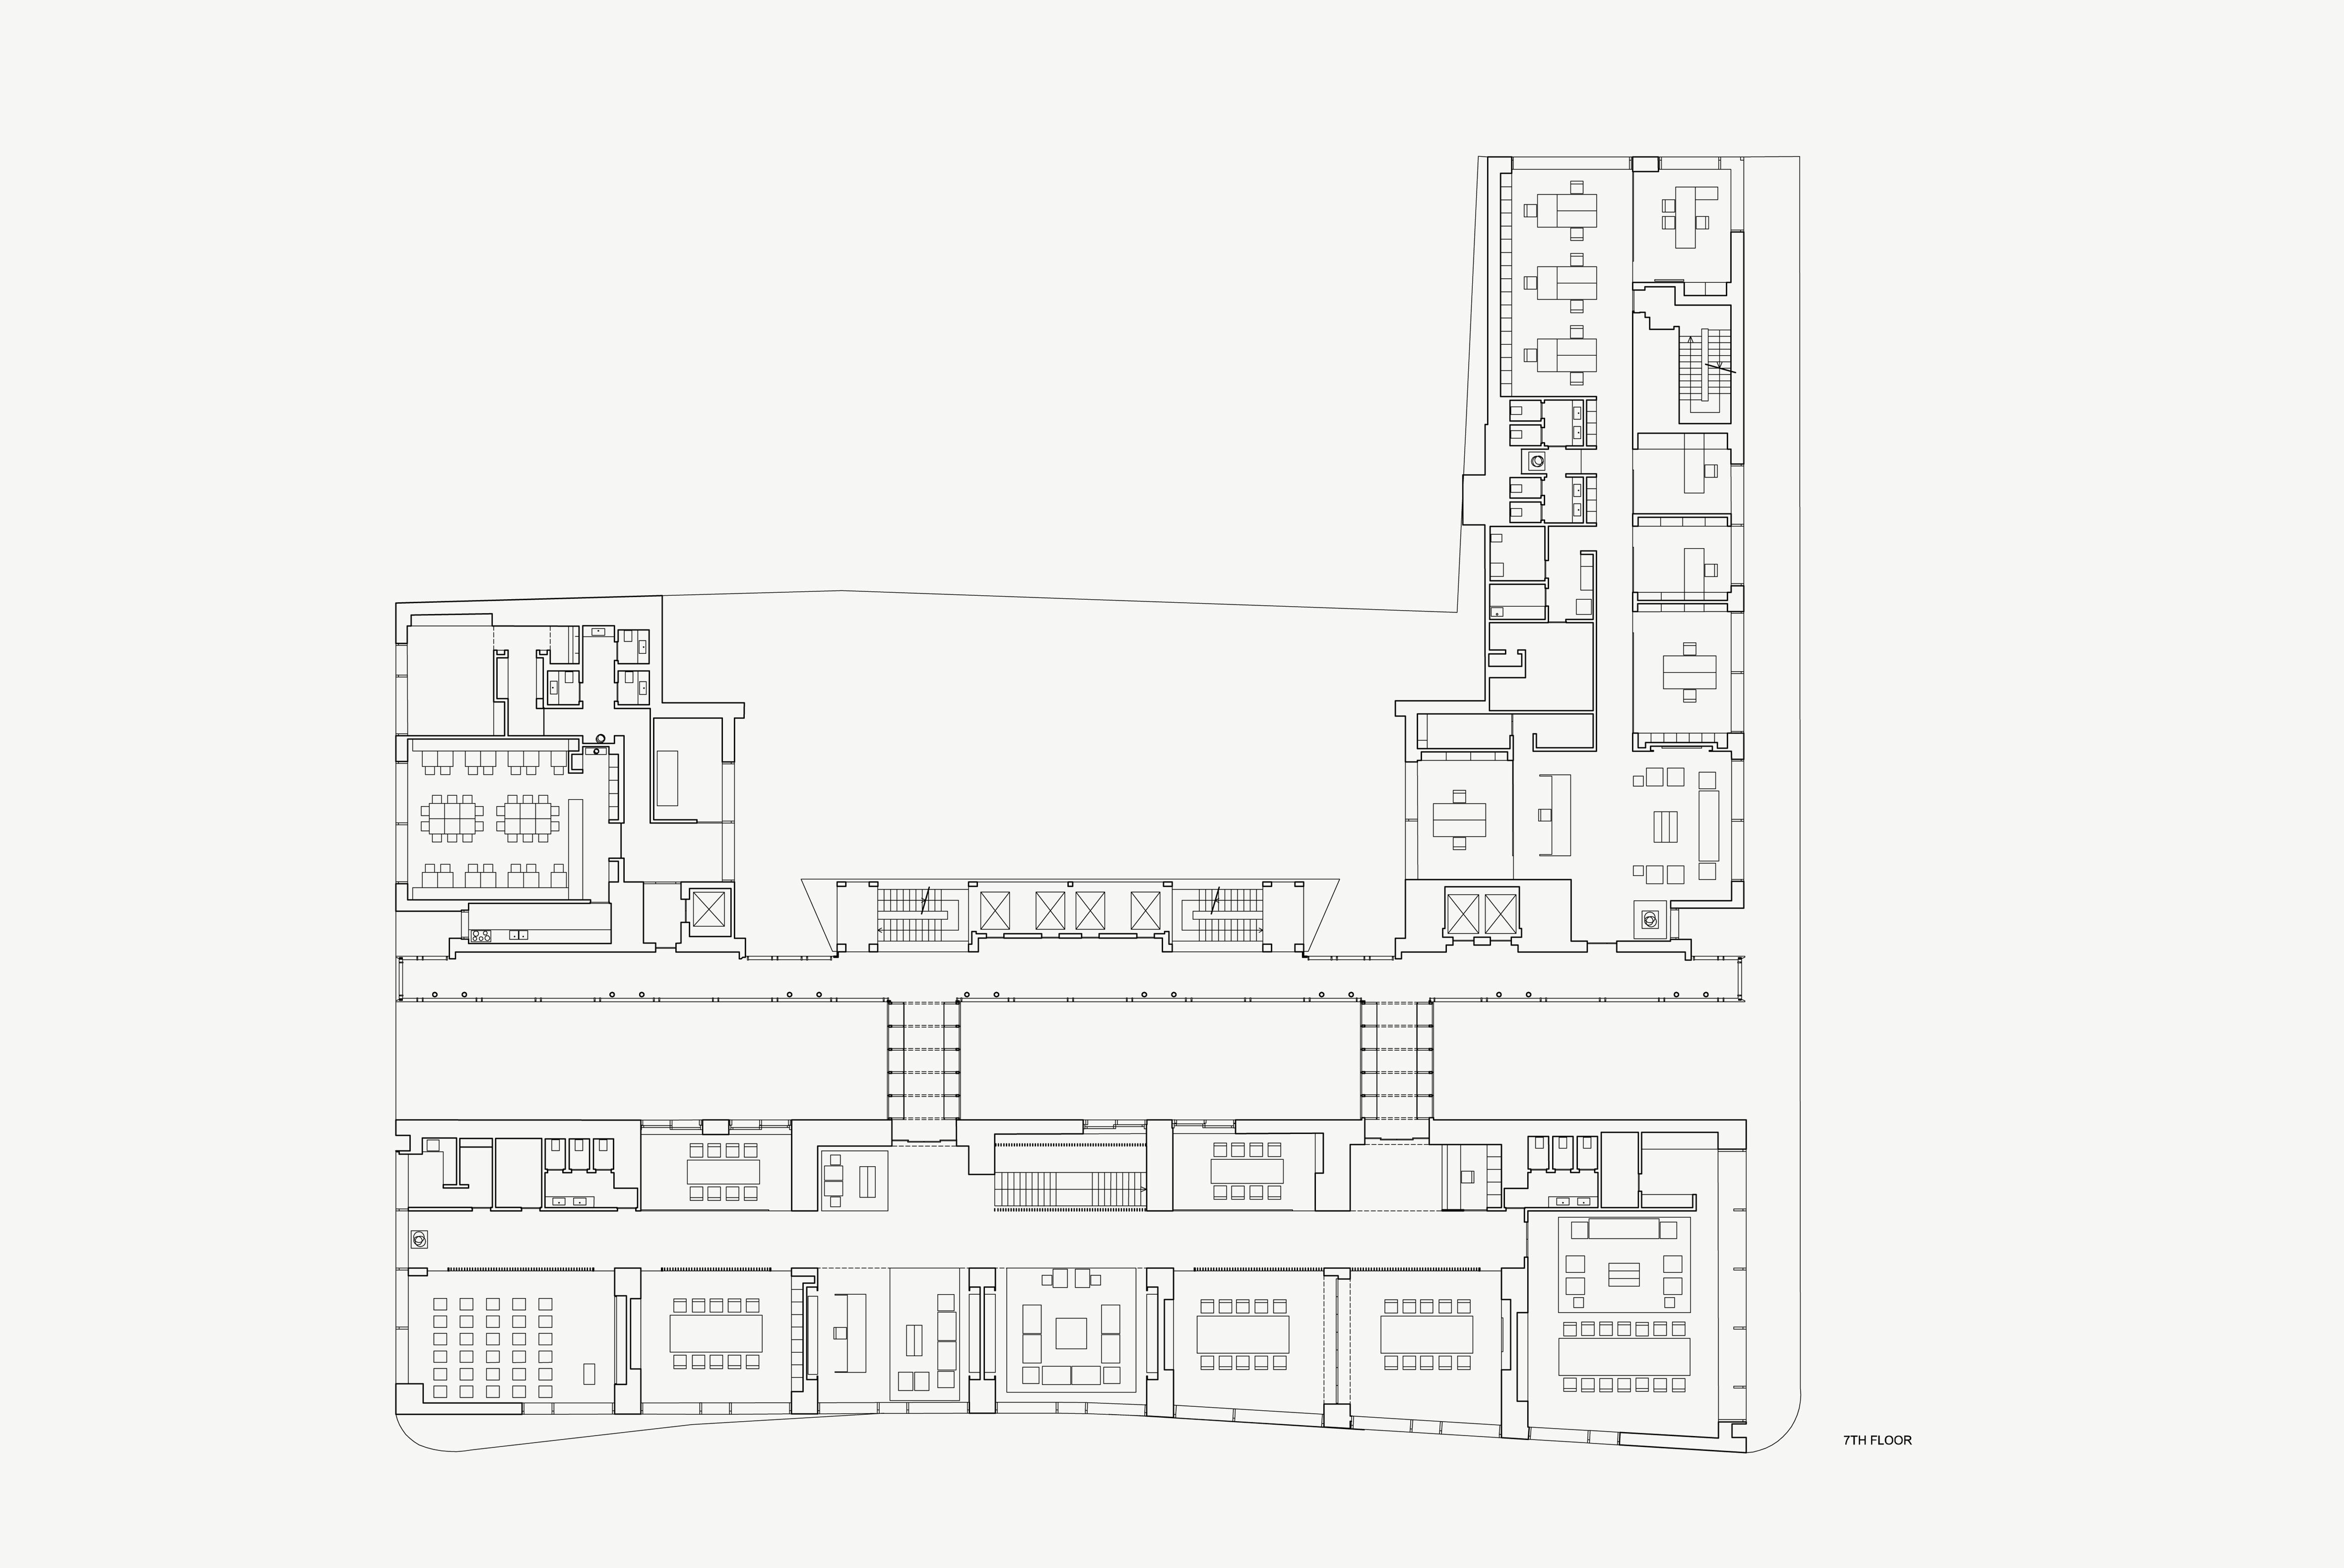 M1 Offices Floorplan 07